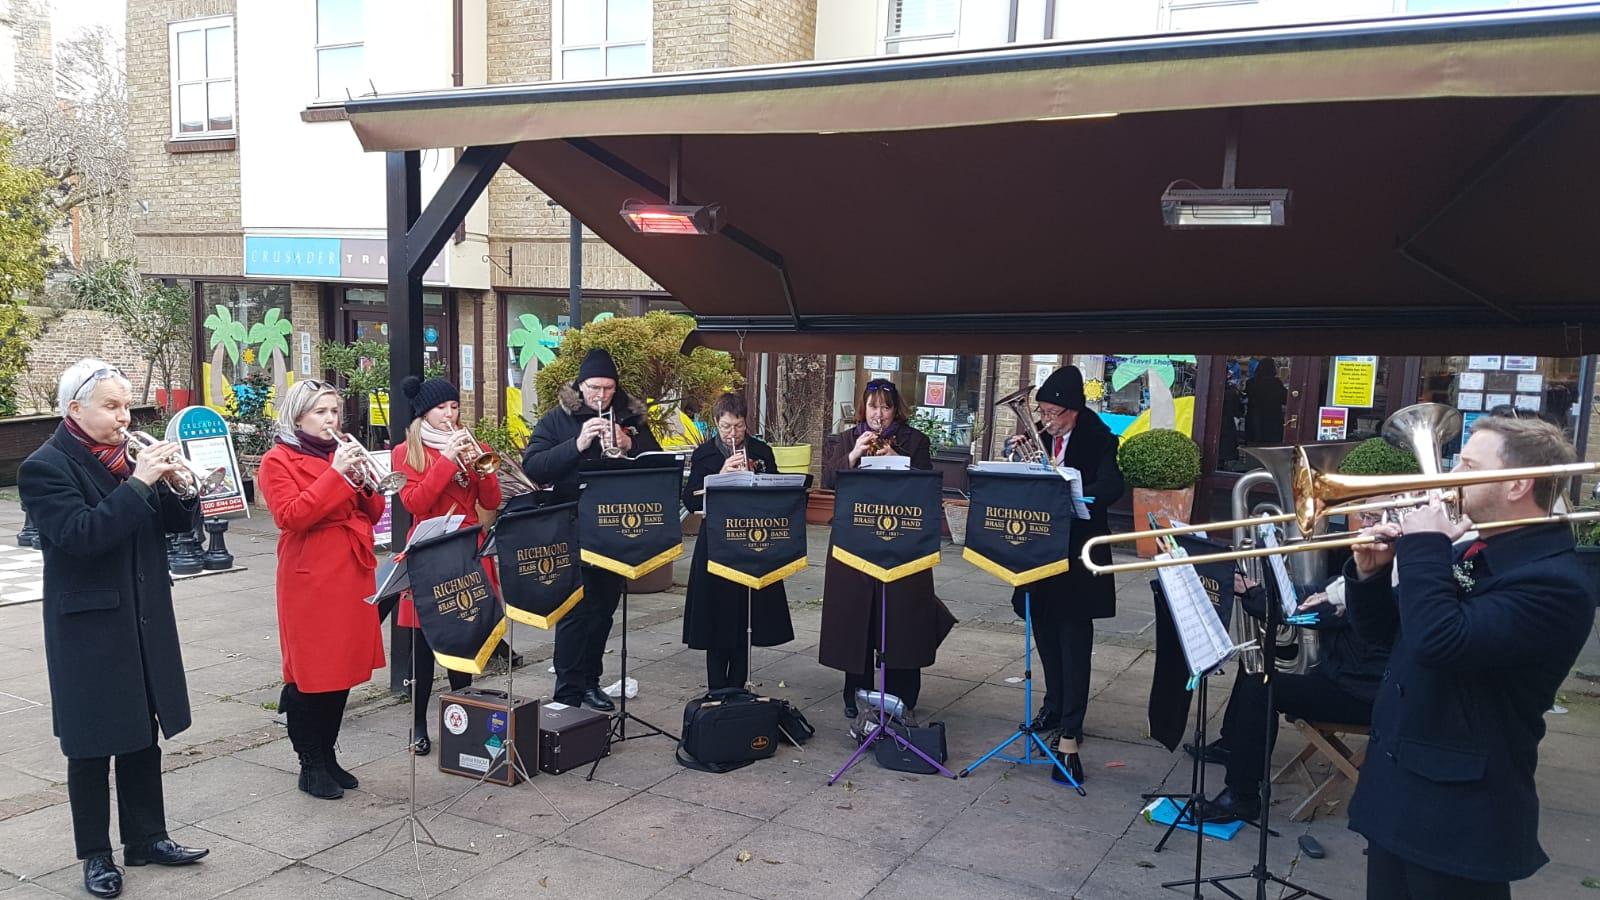 Richmond Brass Band ensemble at Church Street